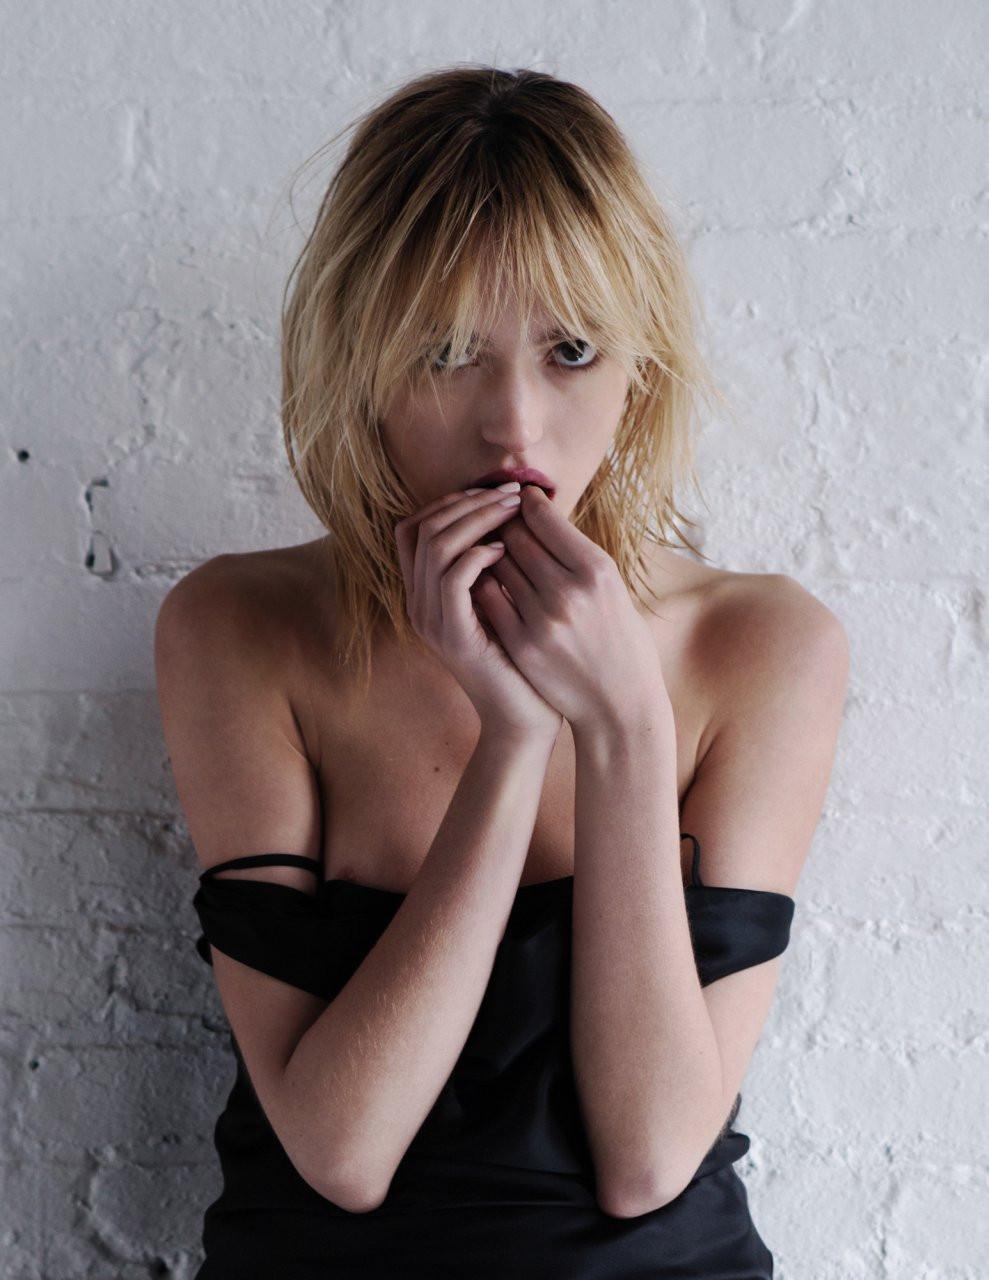 Cora Keegan Naked 16 TheFappening.nu